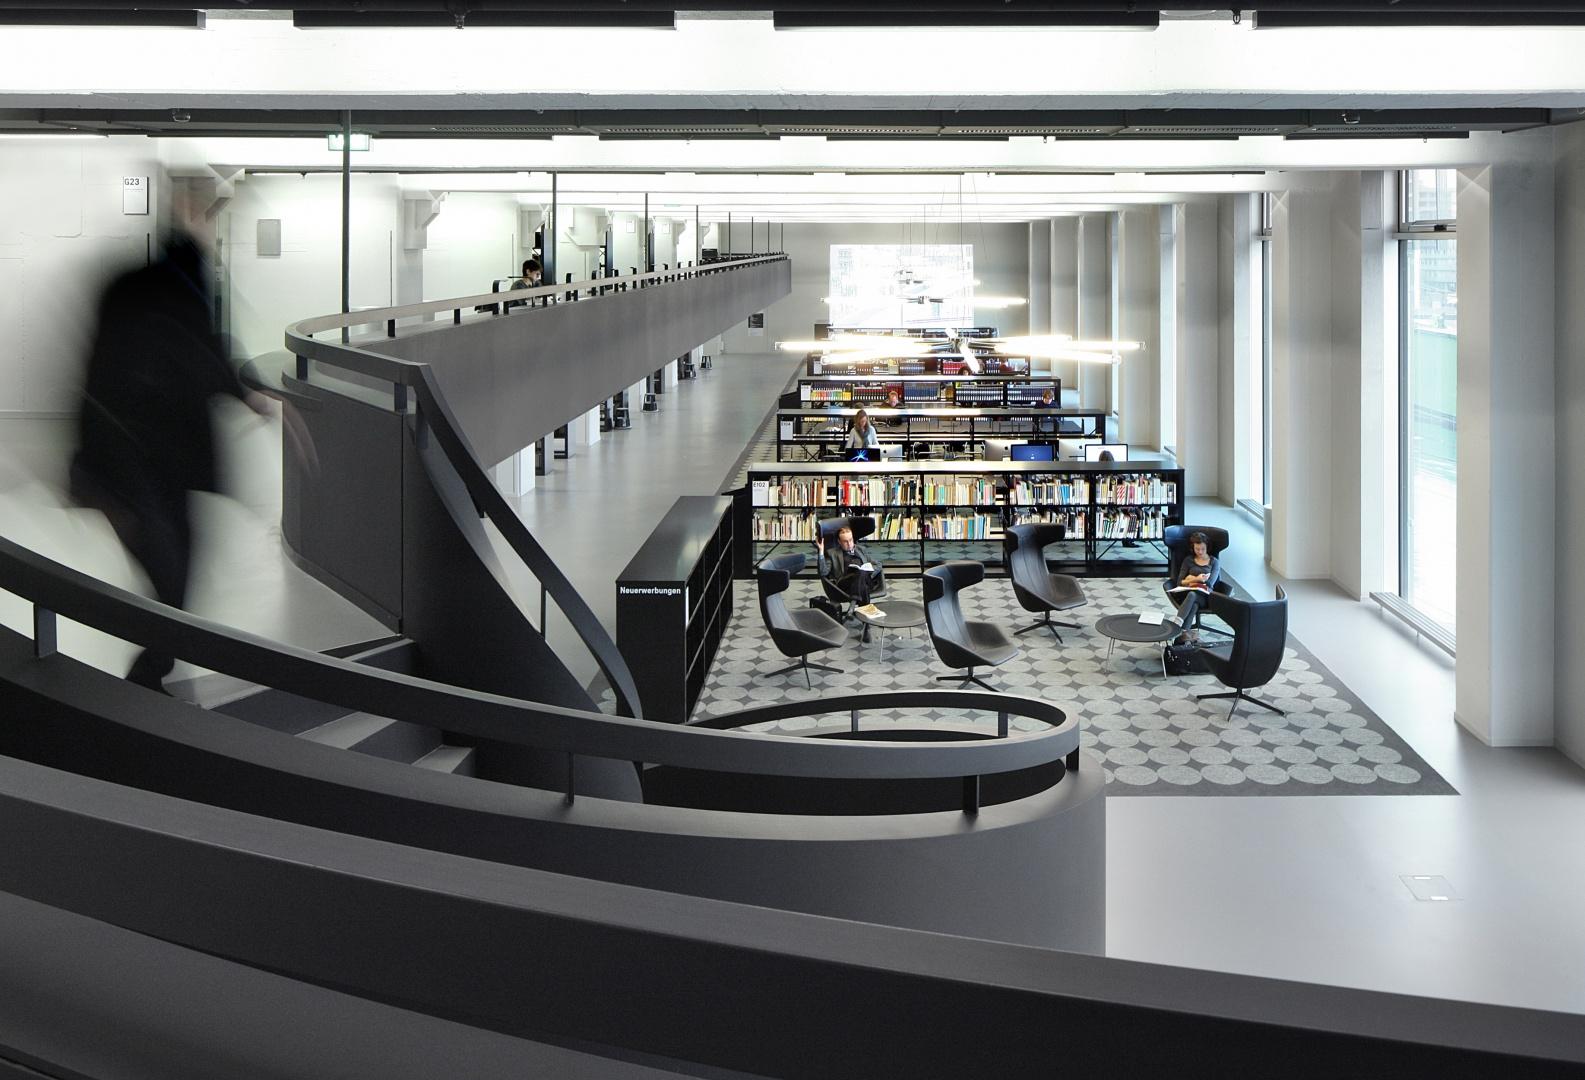 Bibliothèque © Filip Dujardin, Gent